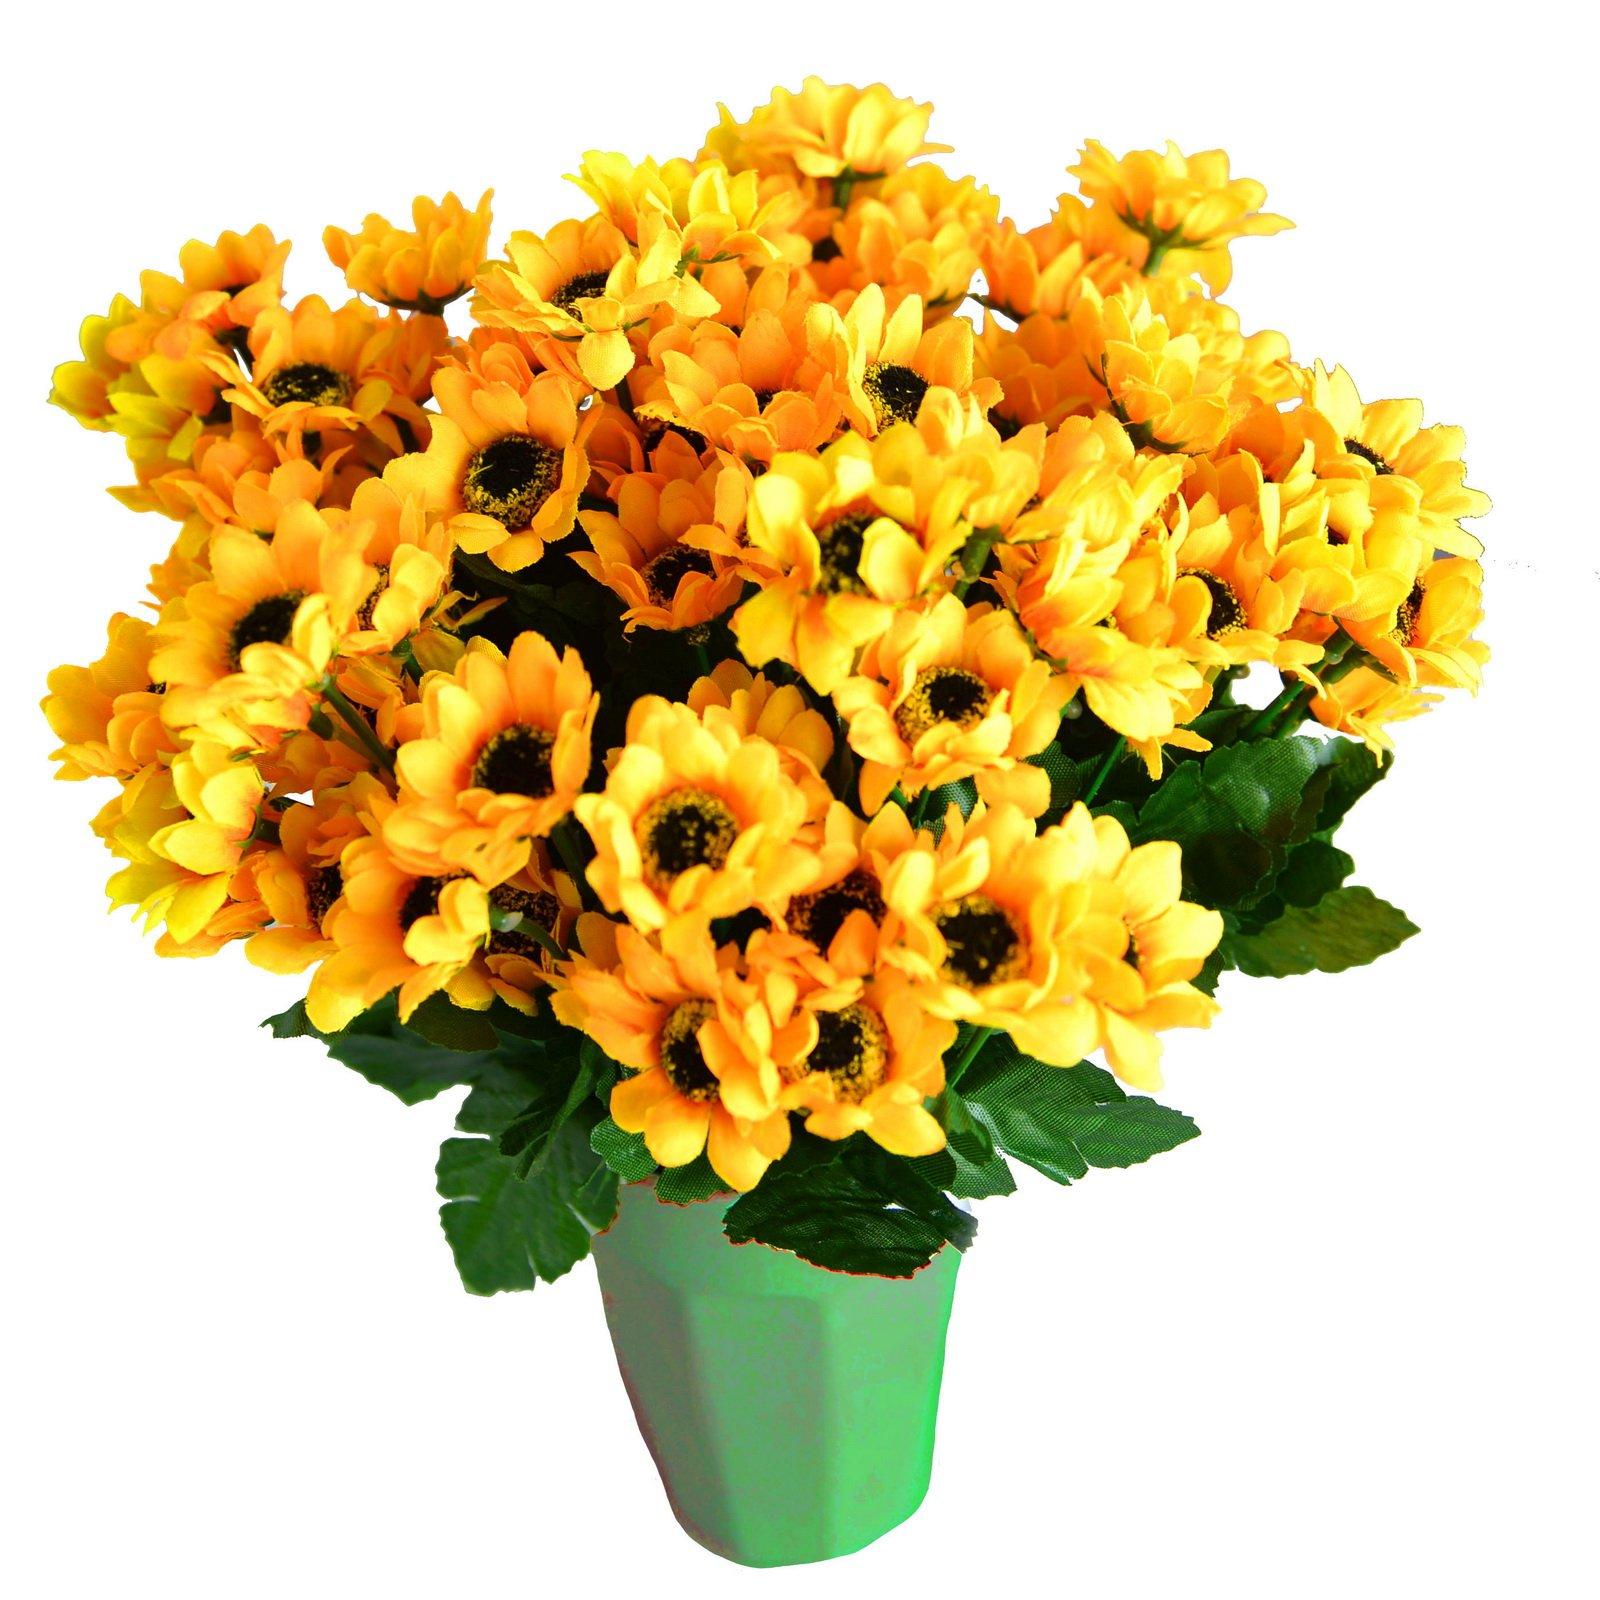 Kinwell Sunflowers Silk Artificial Flowers Floral Decor Bouquet 10 Bunches 14